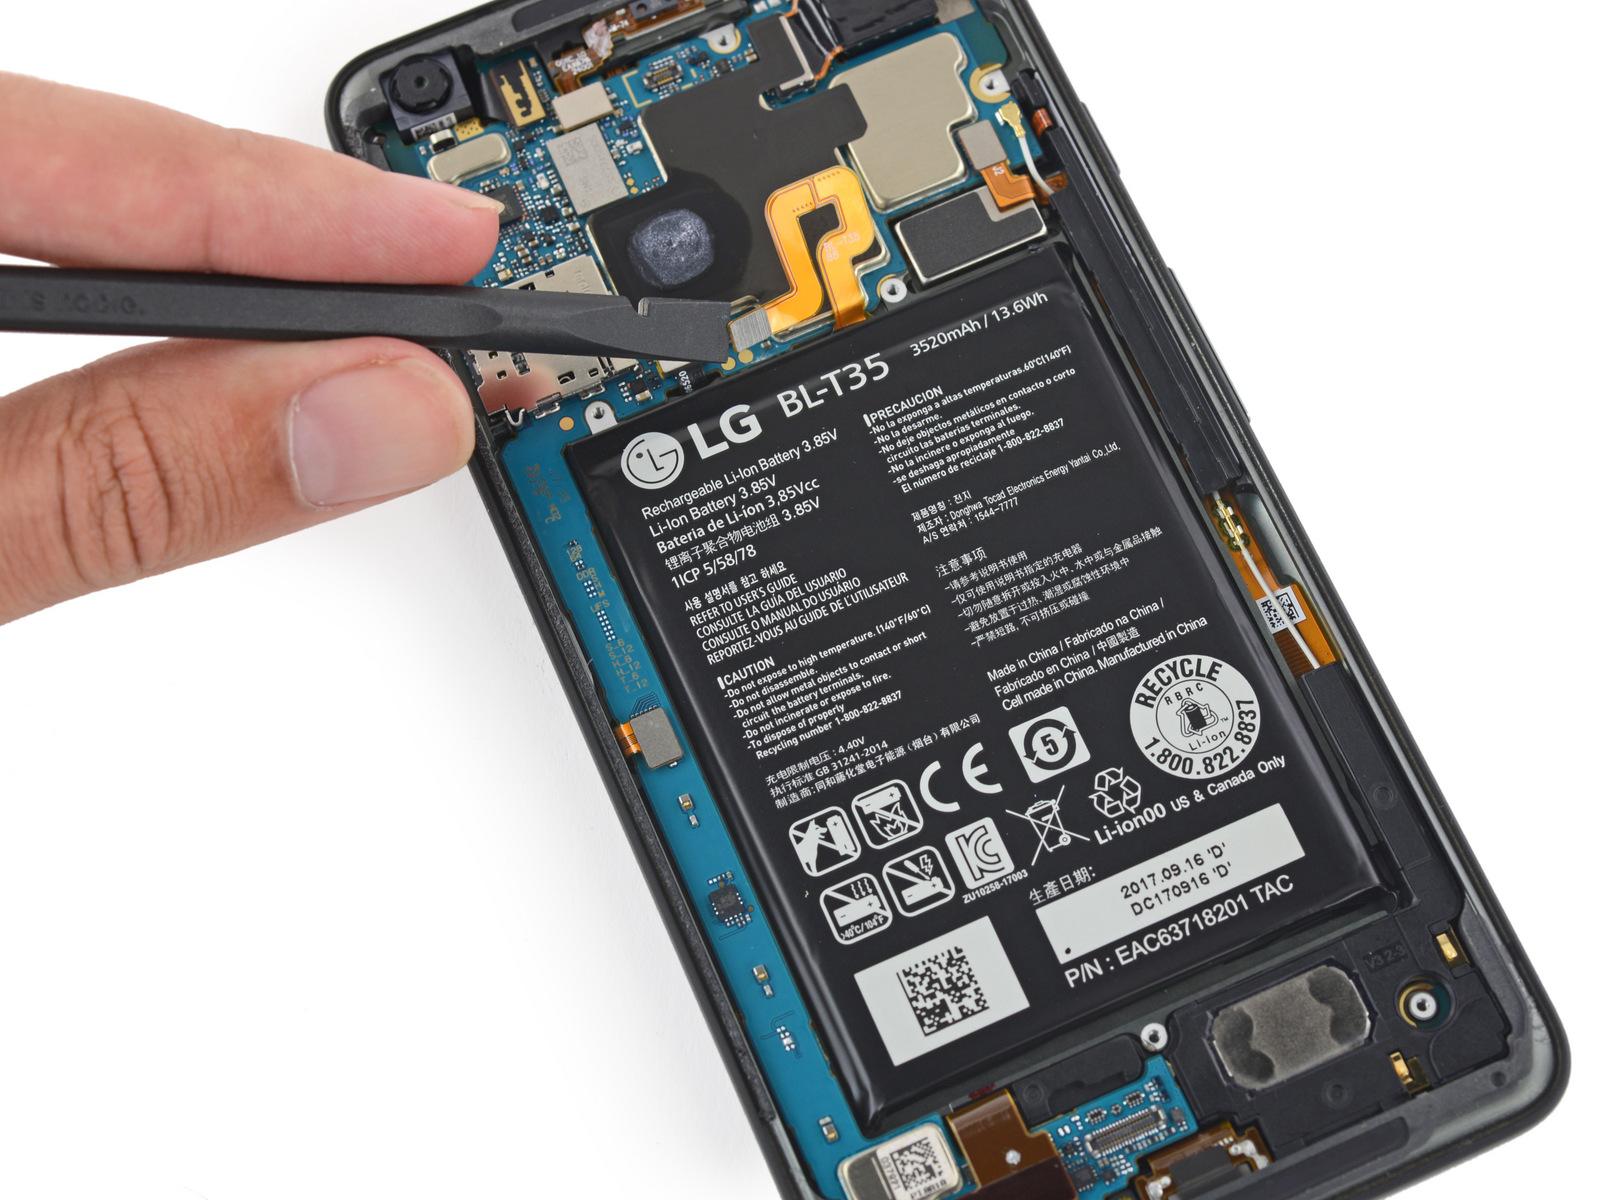 Bateria do Pixel 2 XL